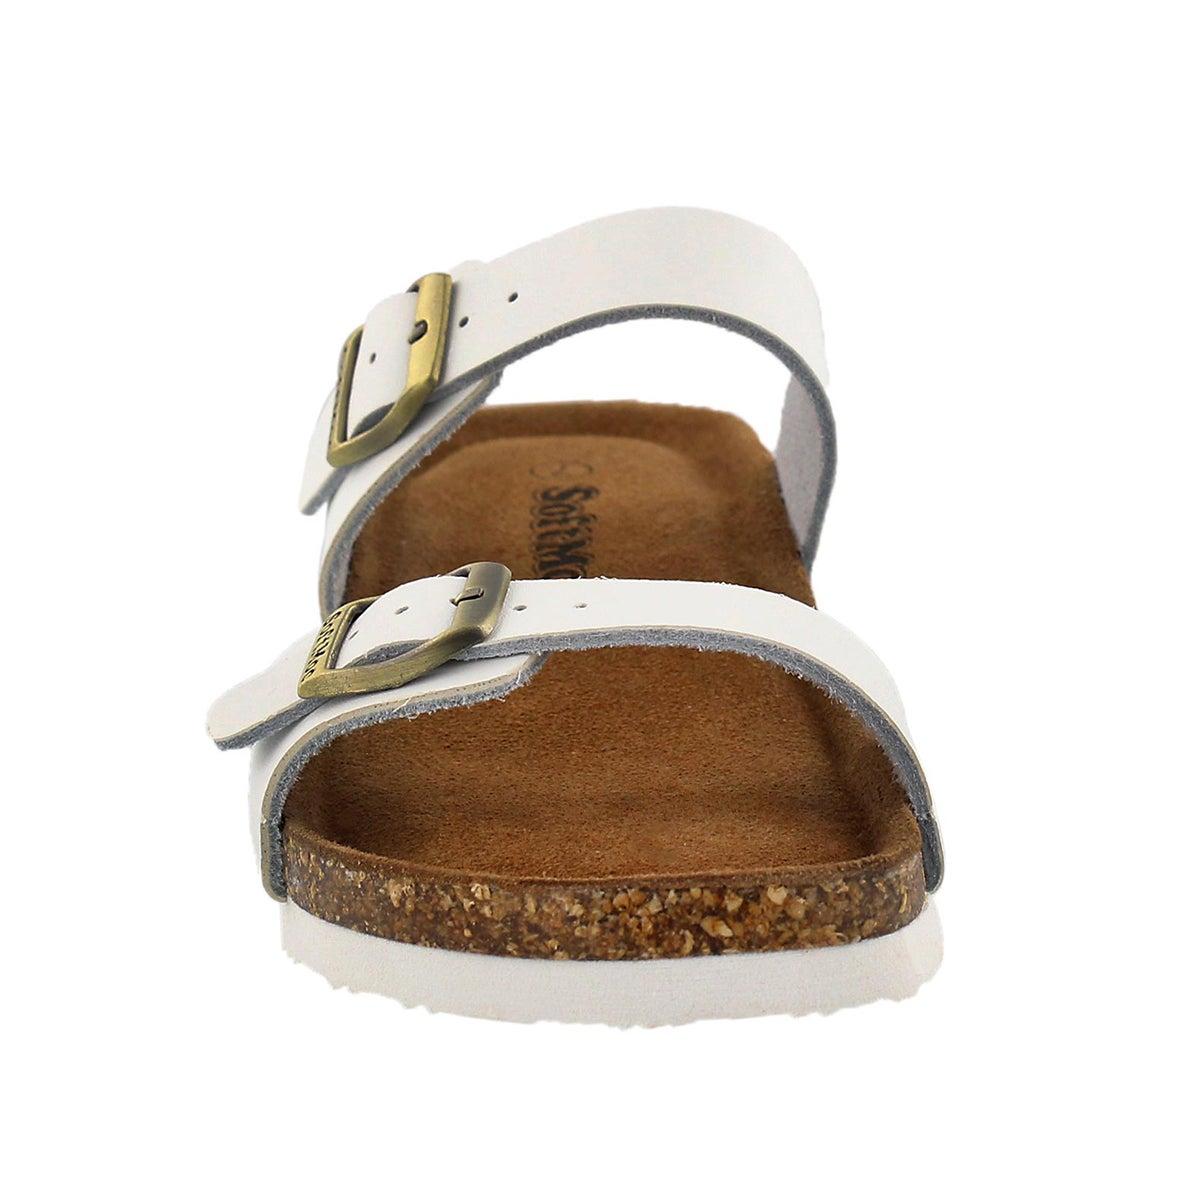 Lds Ashlynn 5 white memory foam sandal